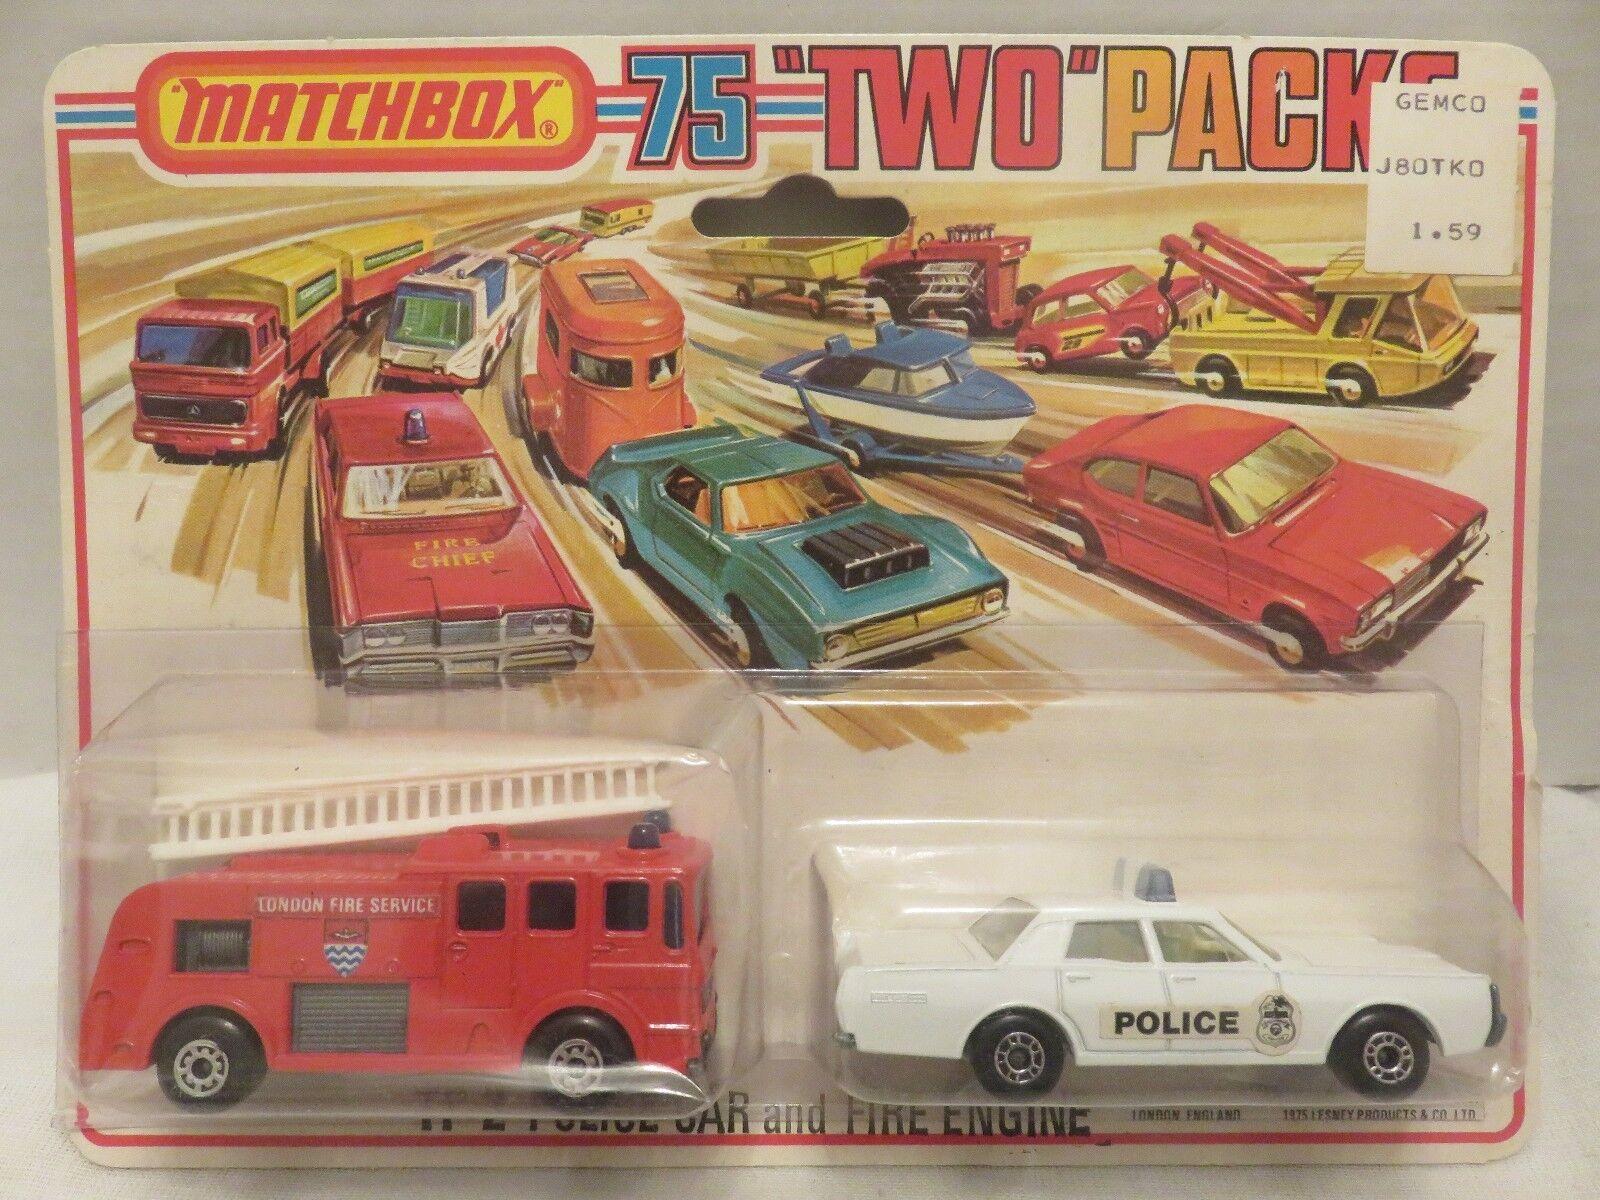 1976 Matchbox dos paquetes patrulla Mercurio bomberos TP-2 Metal Fundido a Troquel